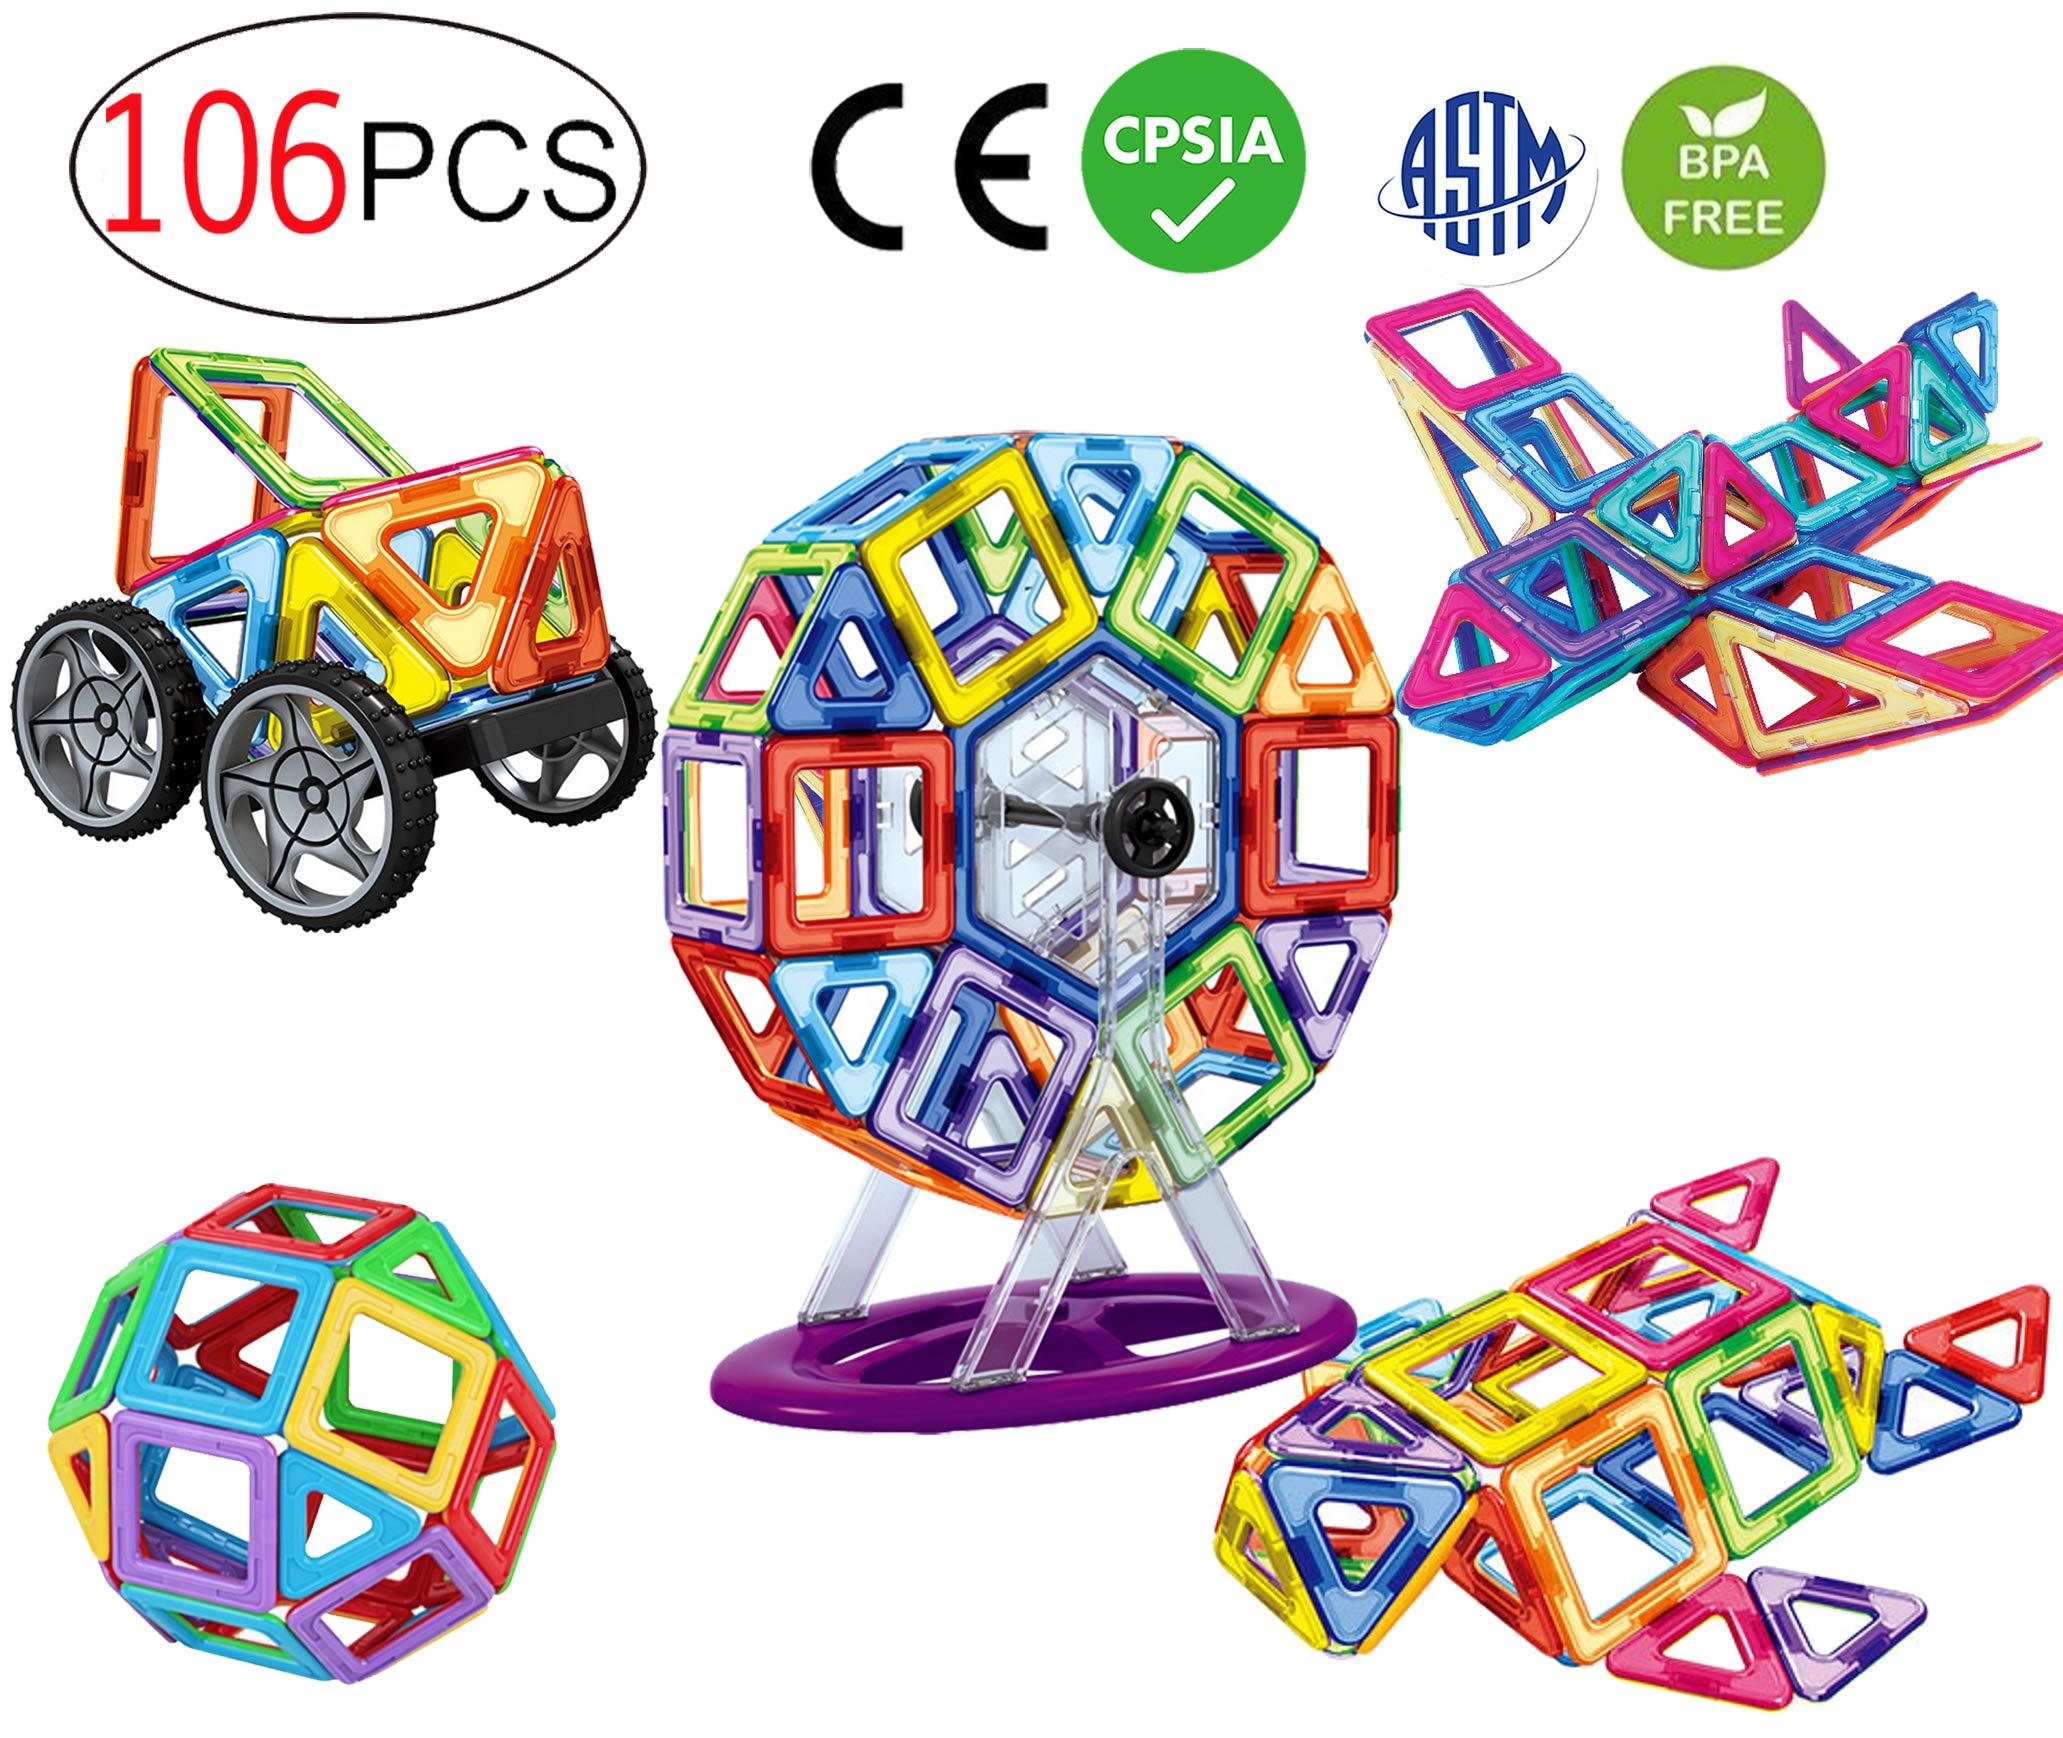 dreambuilderToy 106 PCS Magnetic Tiles Set, STEM Building Block Preschool Educational Construction Kit,3D Magnetic Toys (106 Pieces) by dreambuilderToy